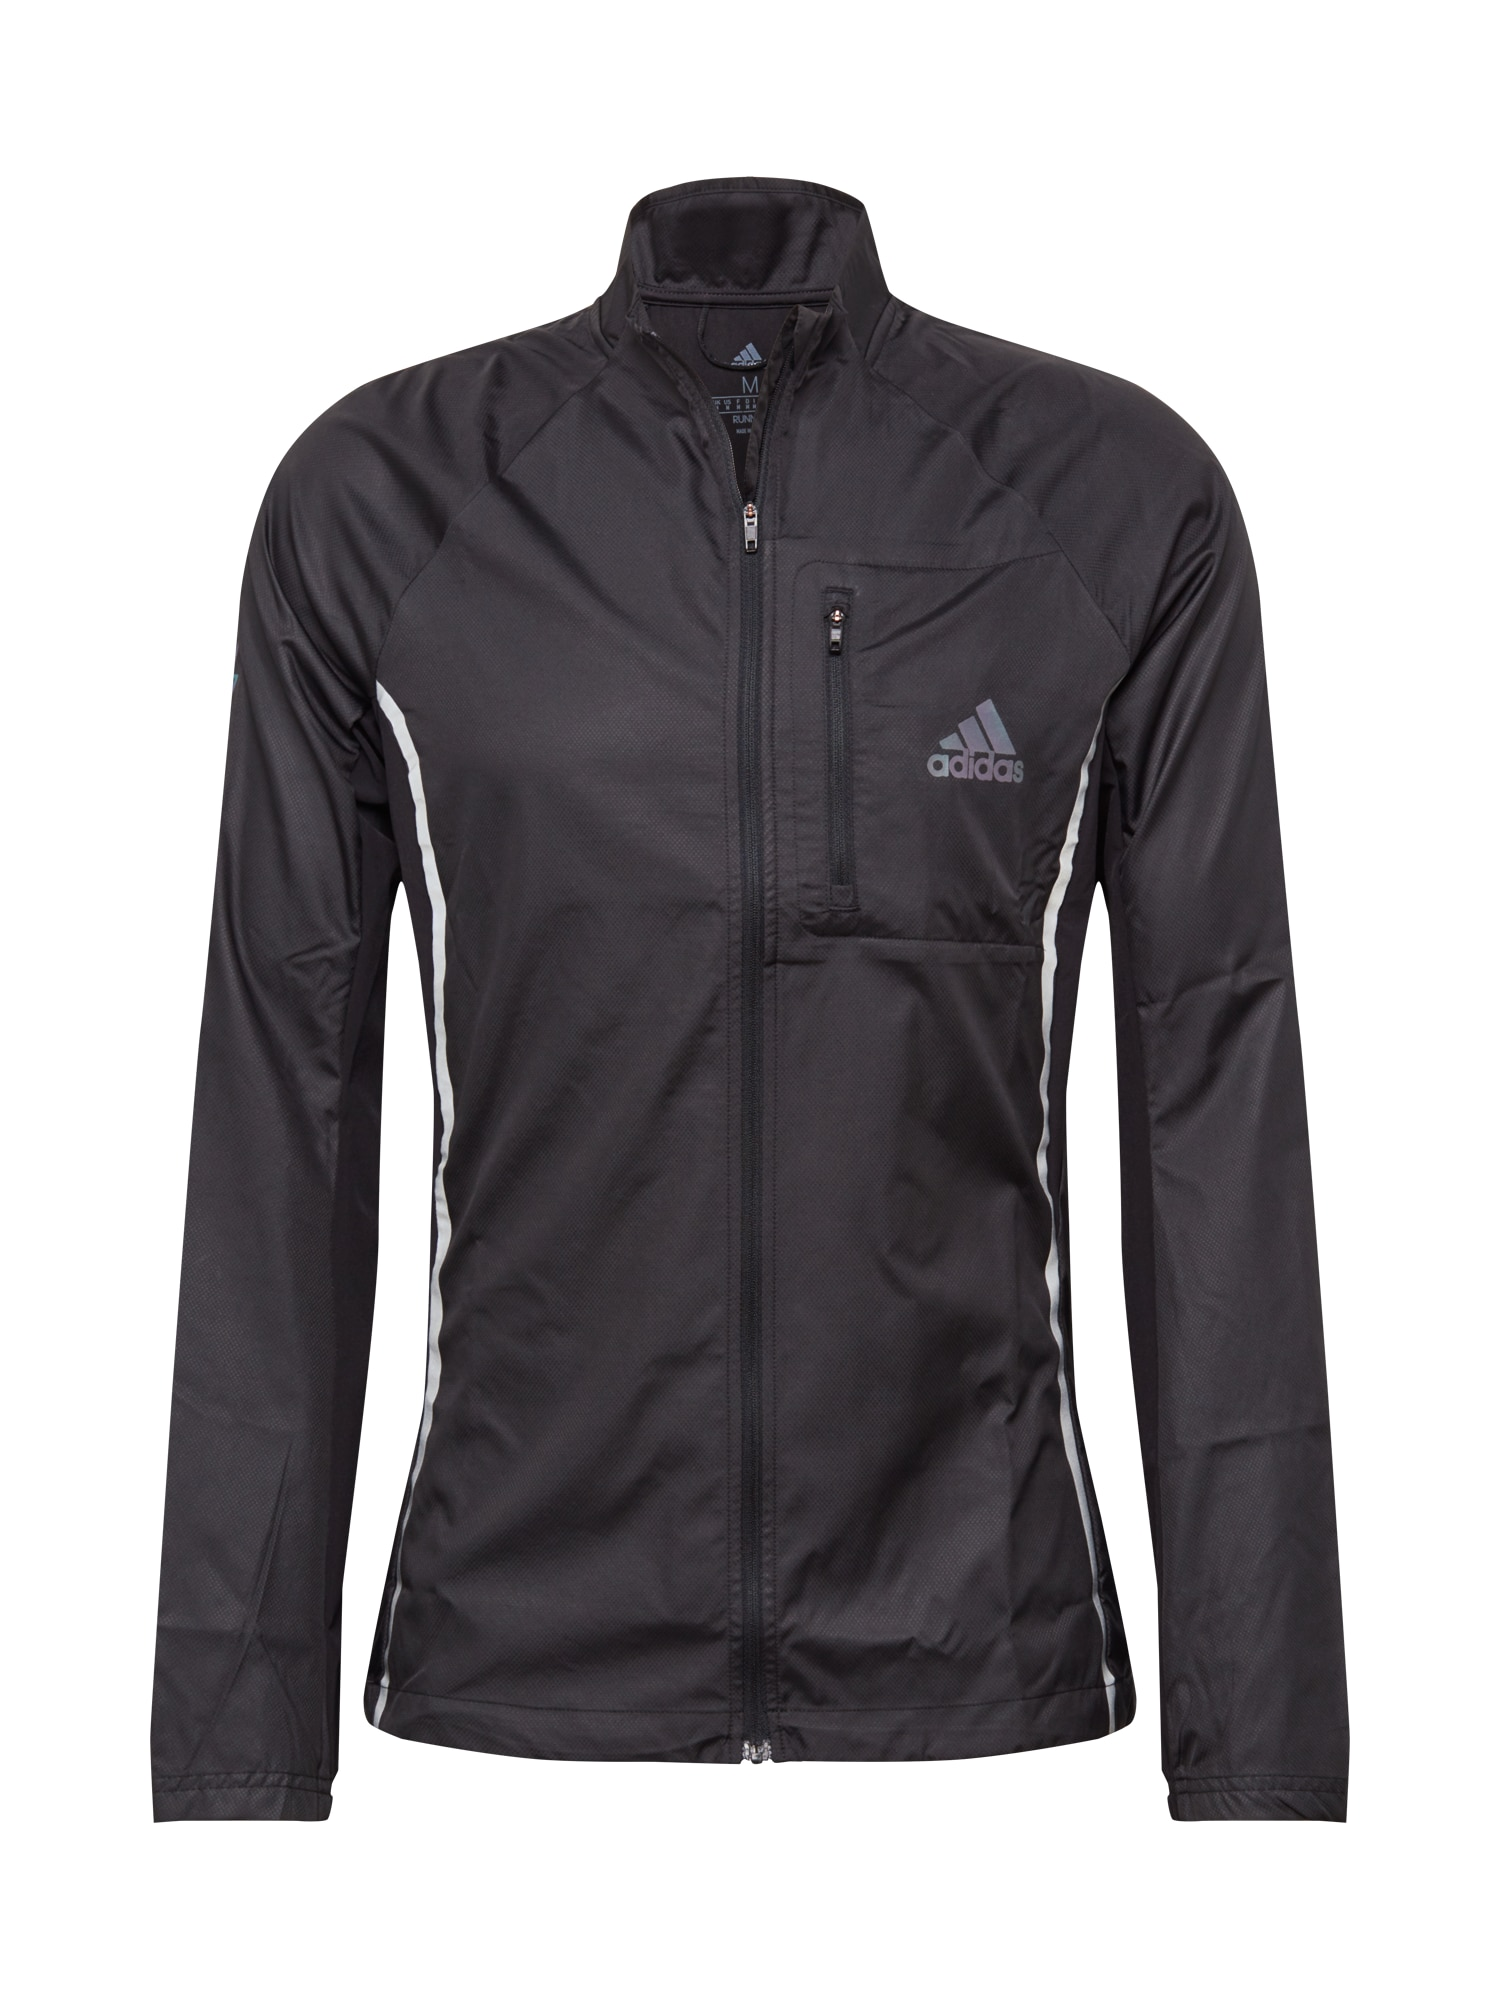 ADIDAS PERFORMANCE Sportovní bunda  černá / stříbrná